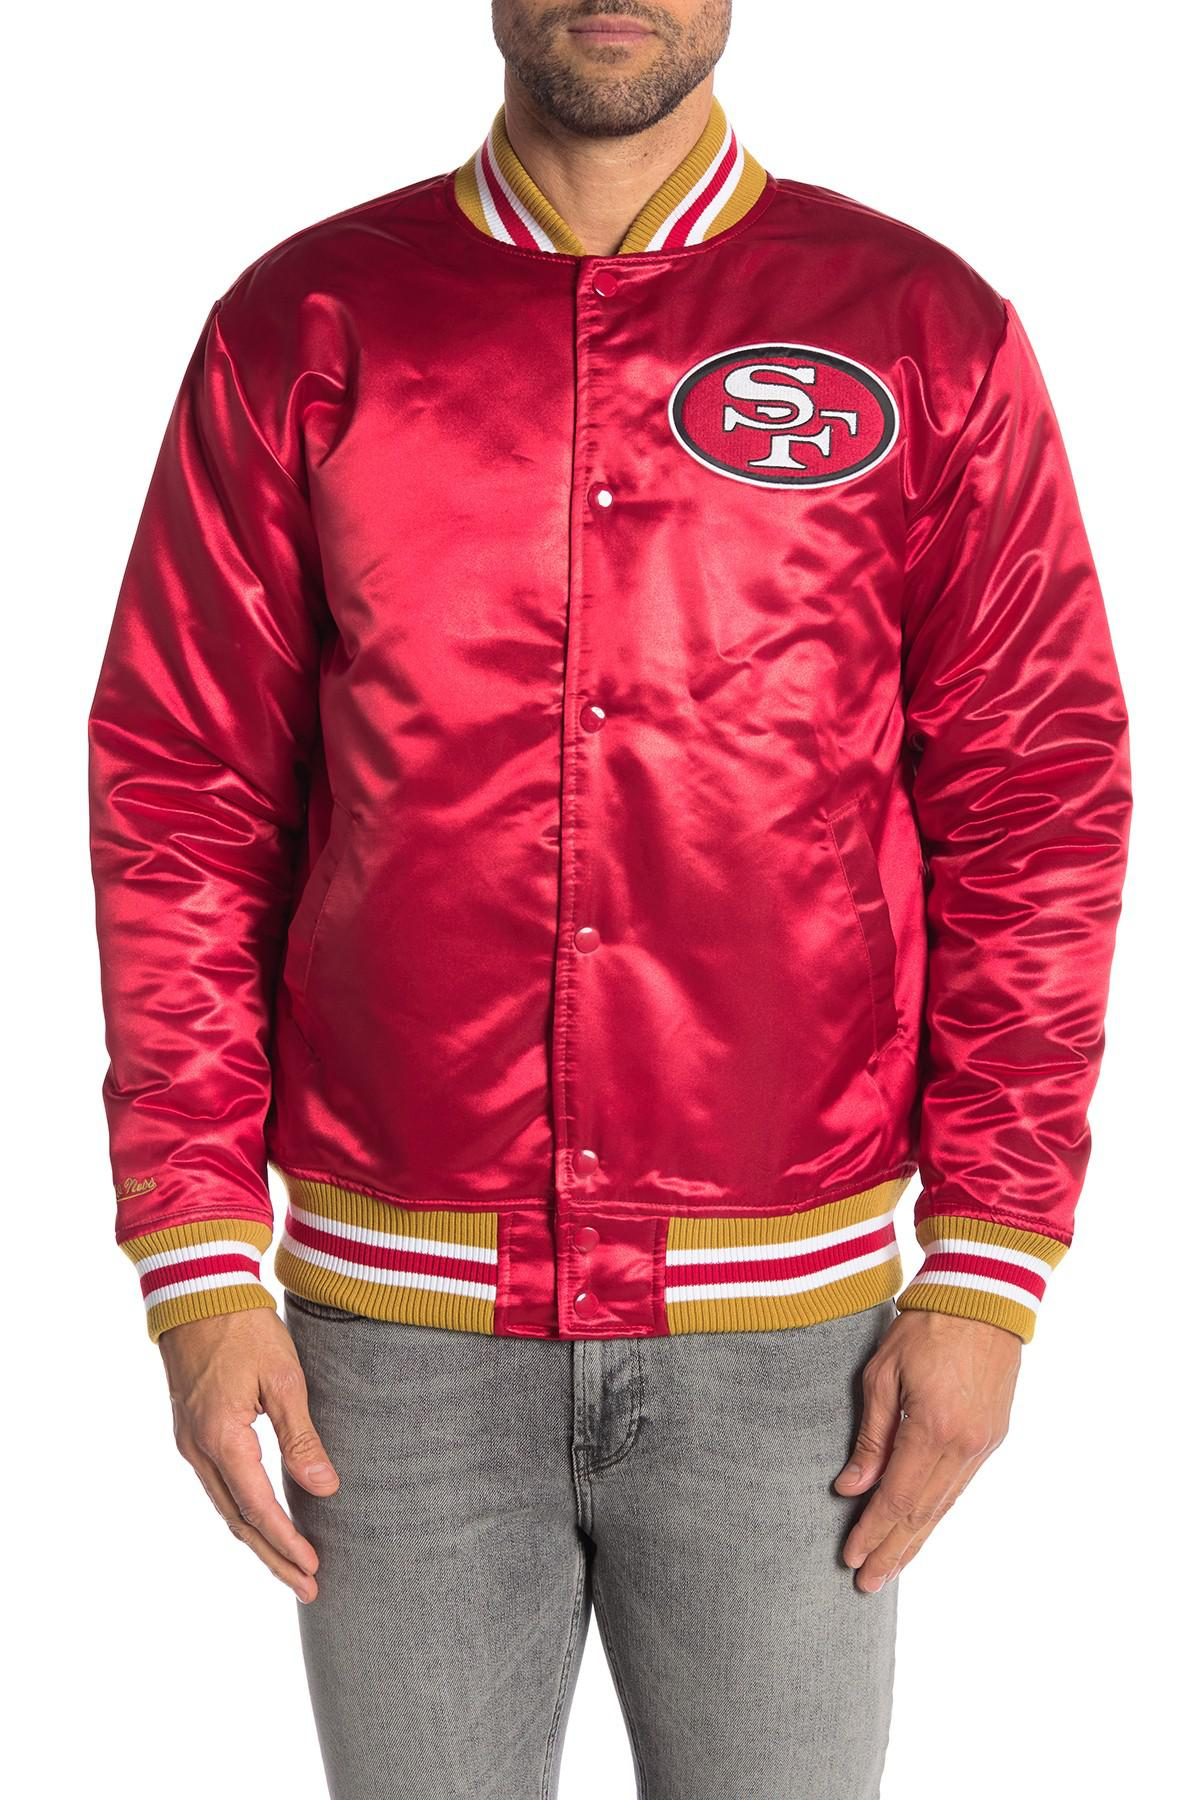 ab9b5e3bdf0 Mitchell   Ness Nfl San Francisco 49ers Satin Jacket in Black for ...